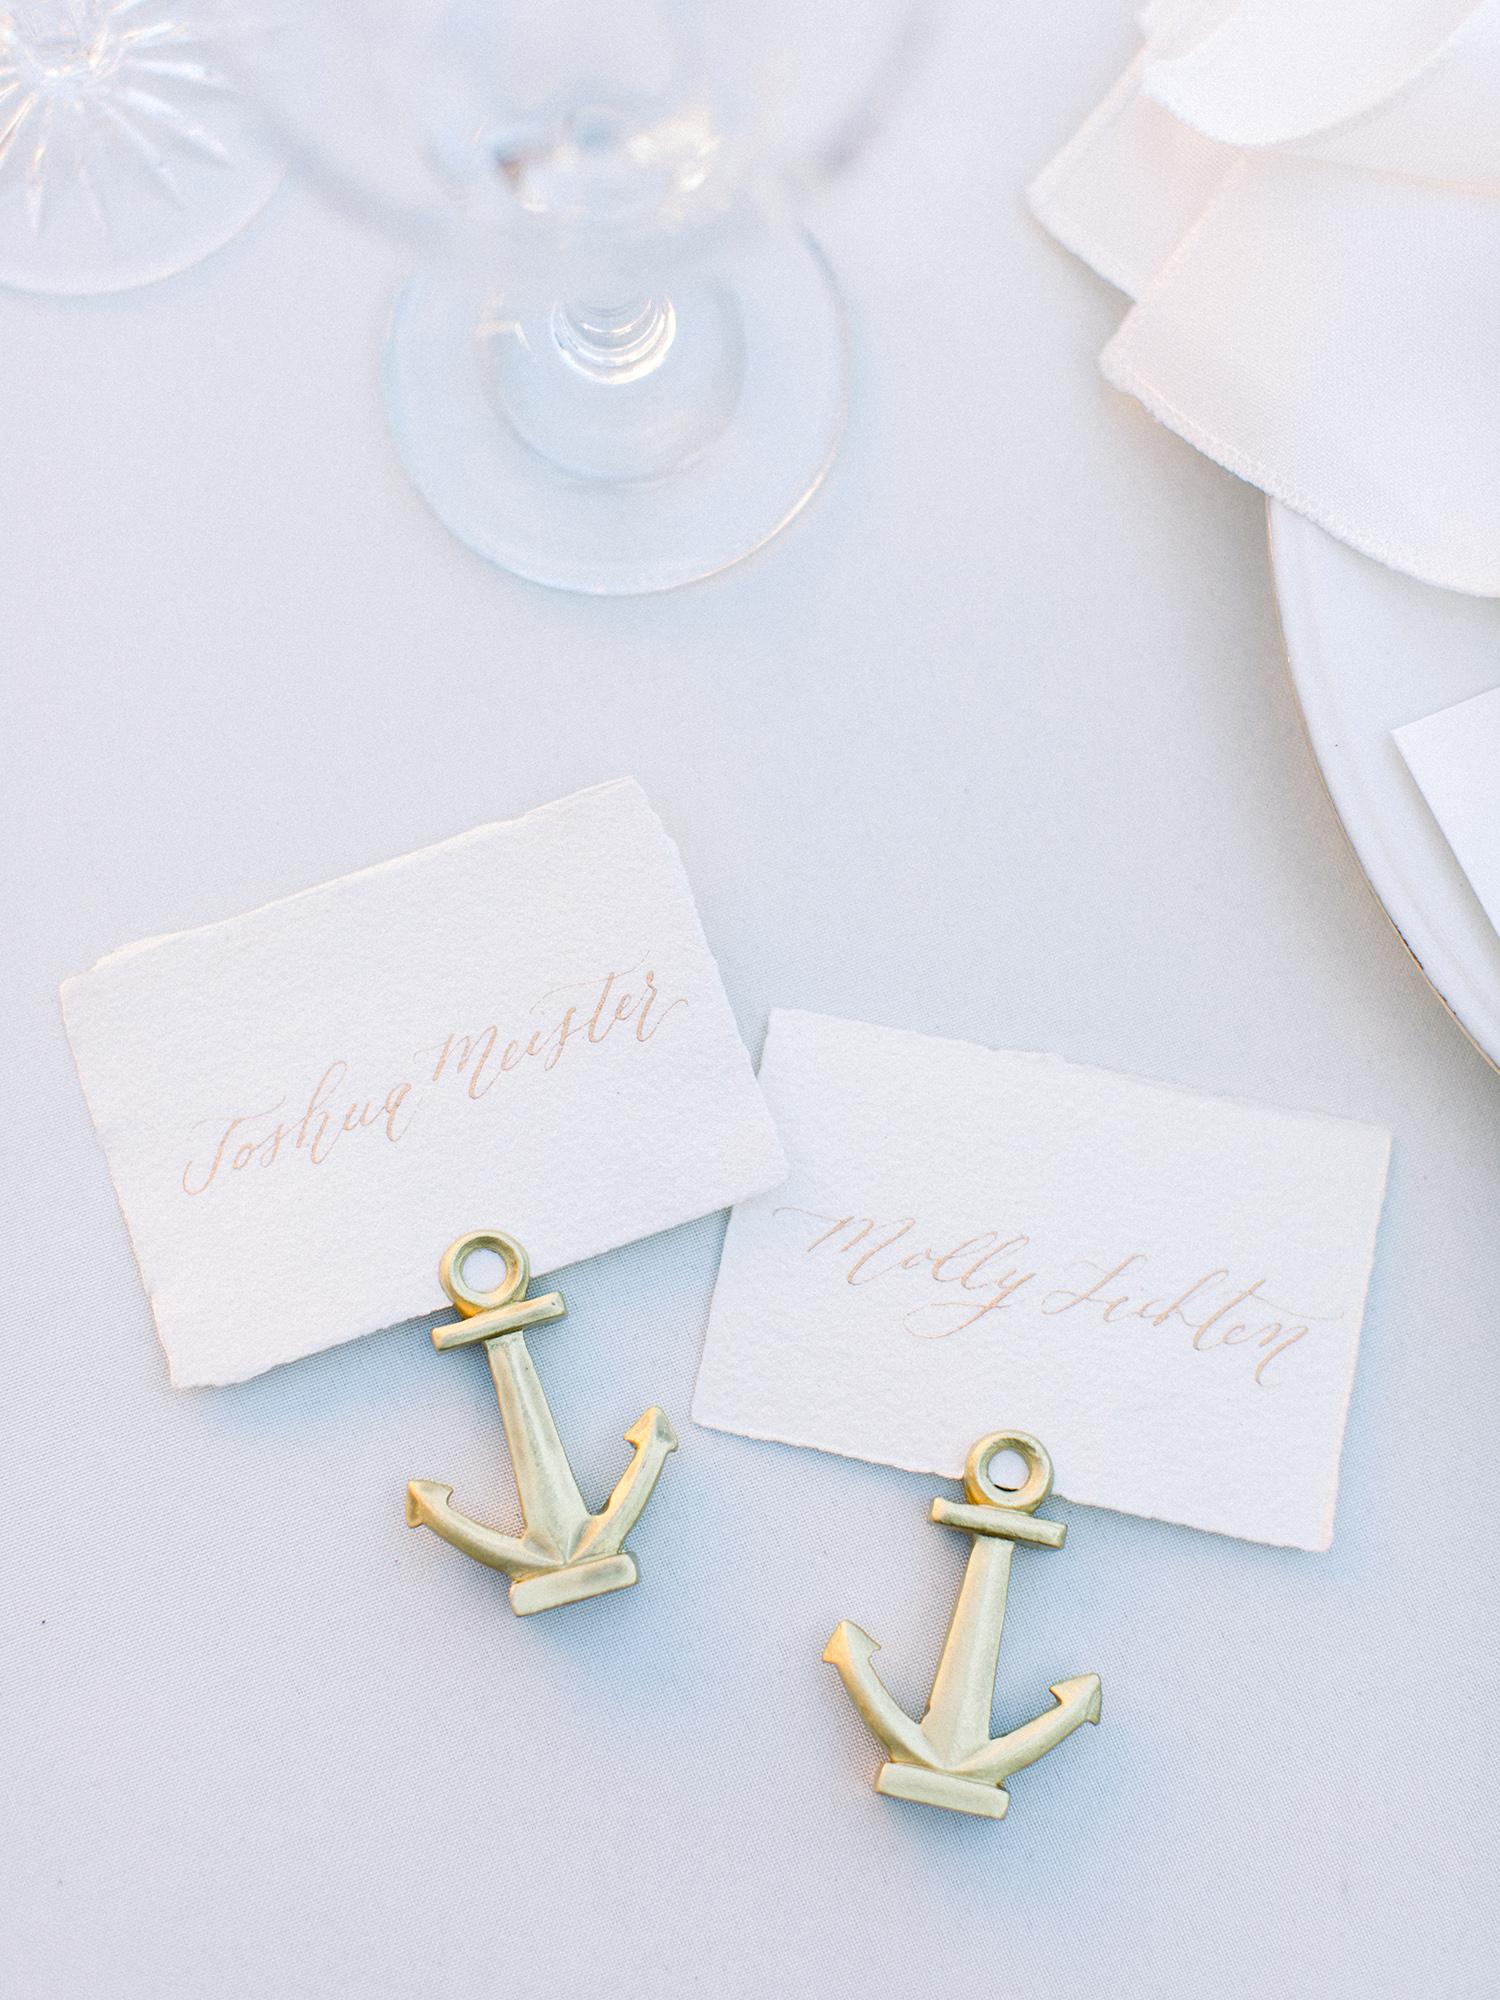 molly josh wedding place cards